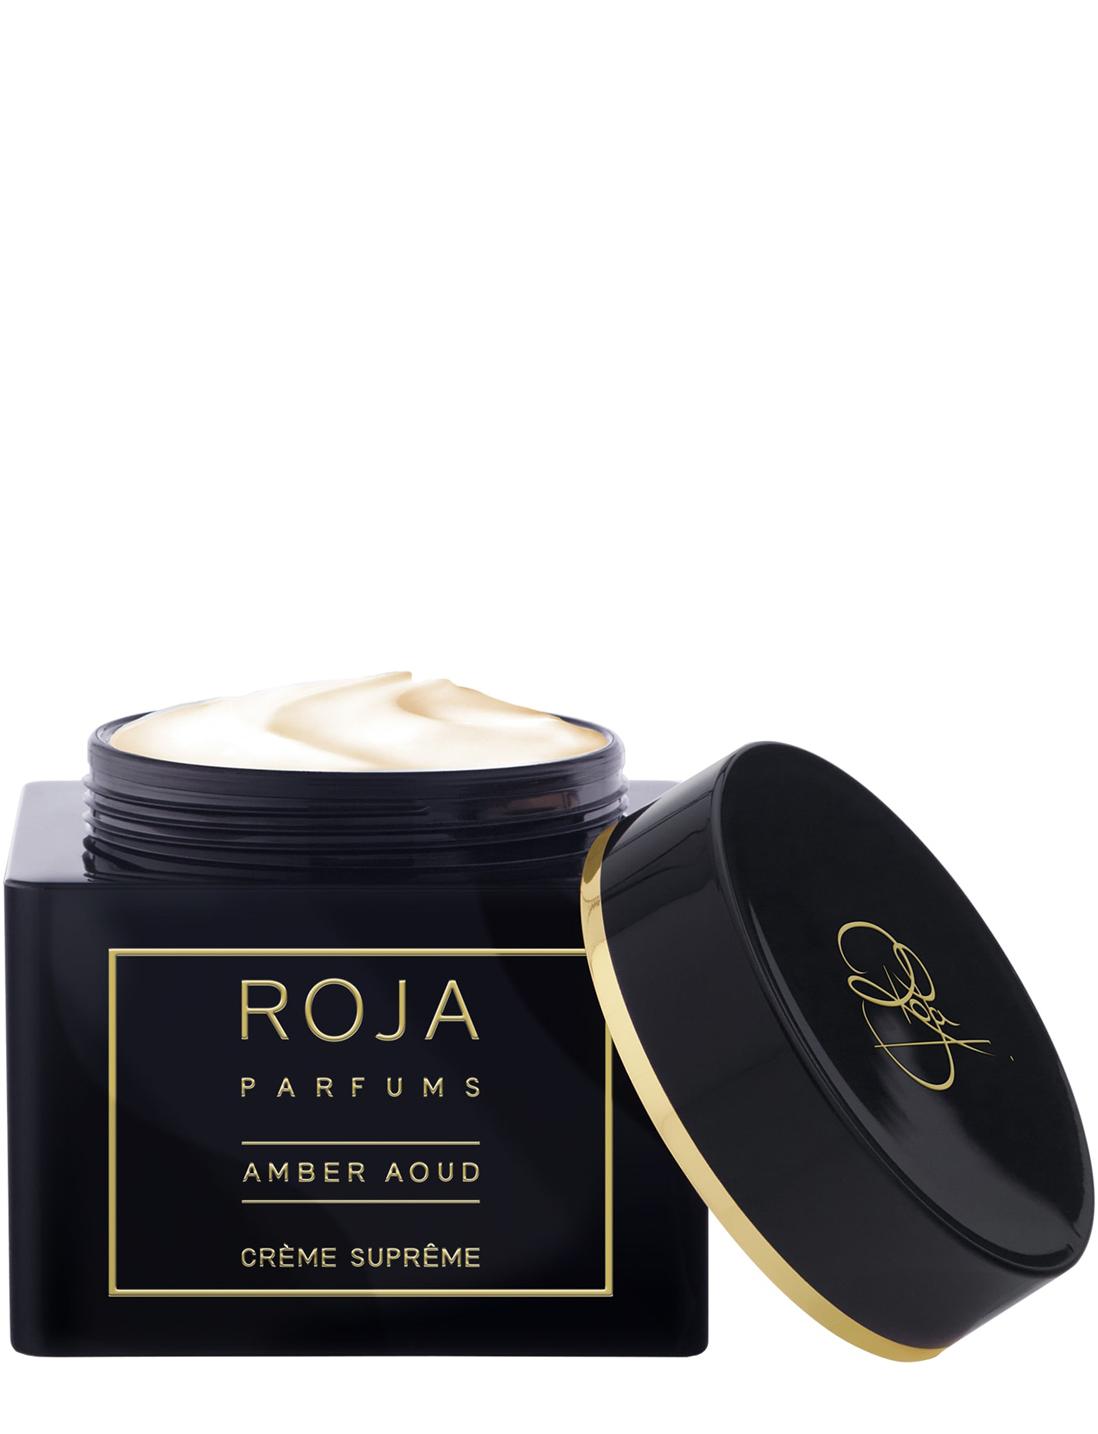 Amber Aoud Crème Suprême